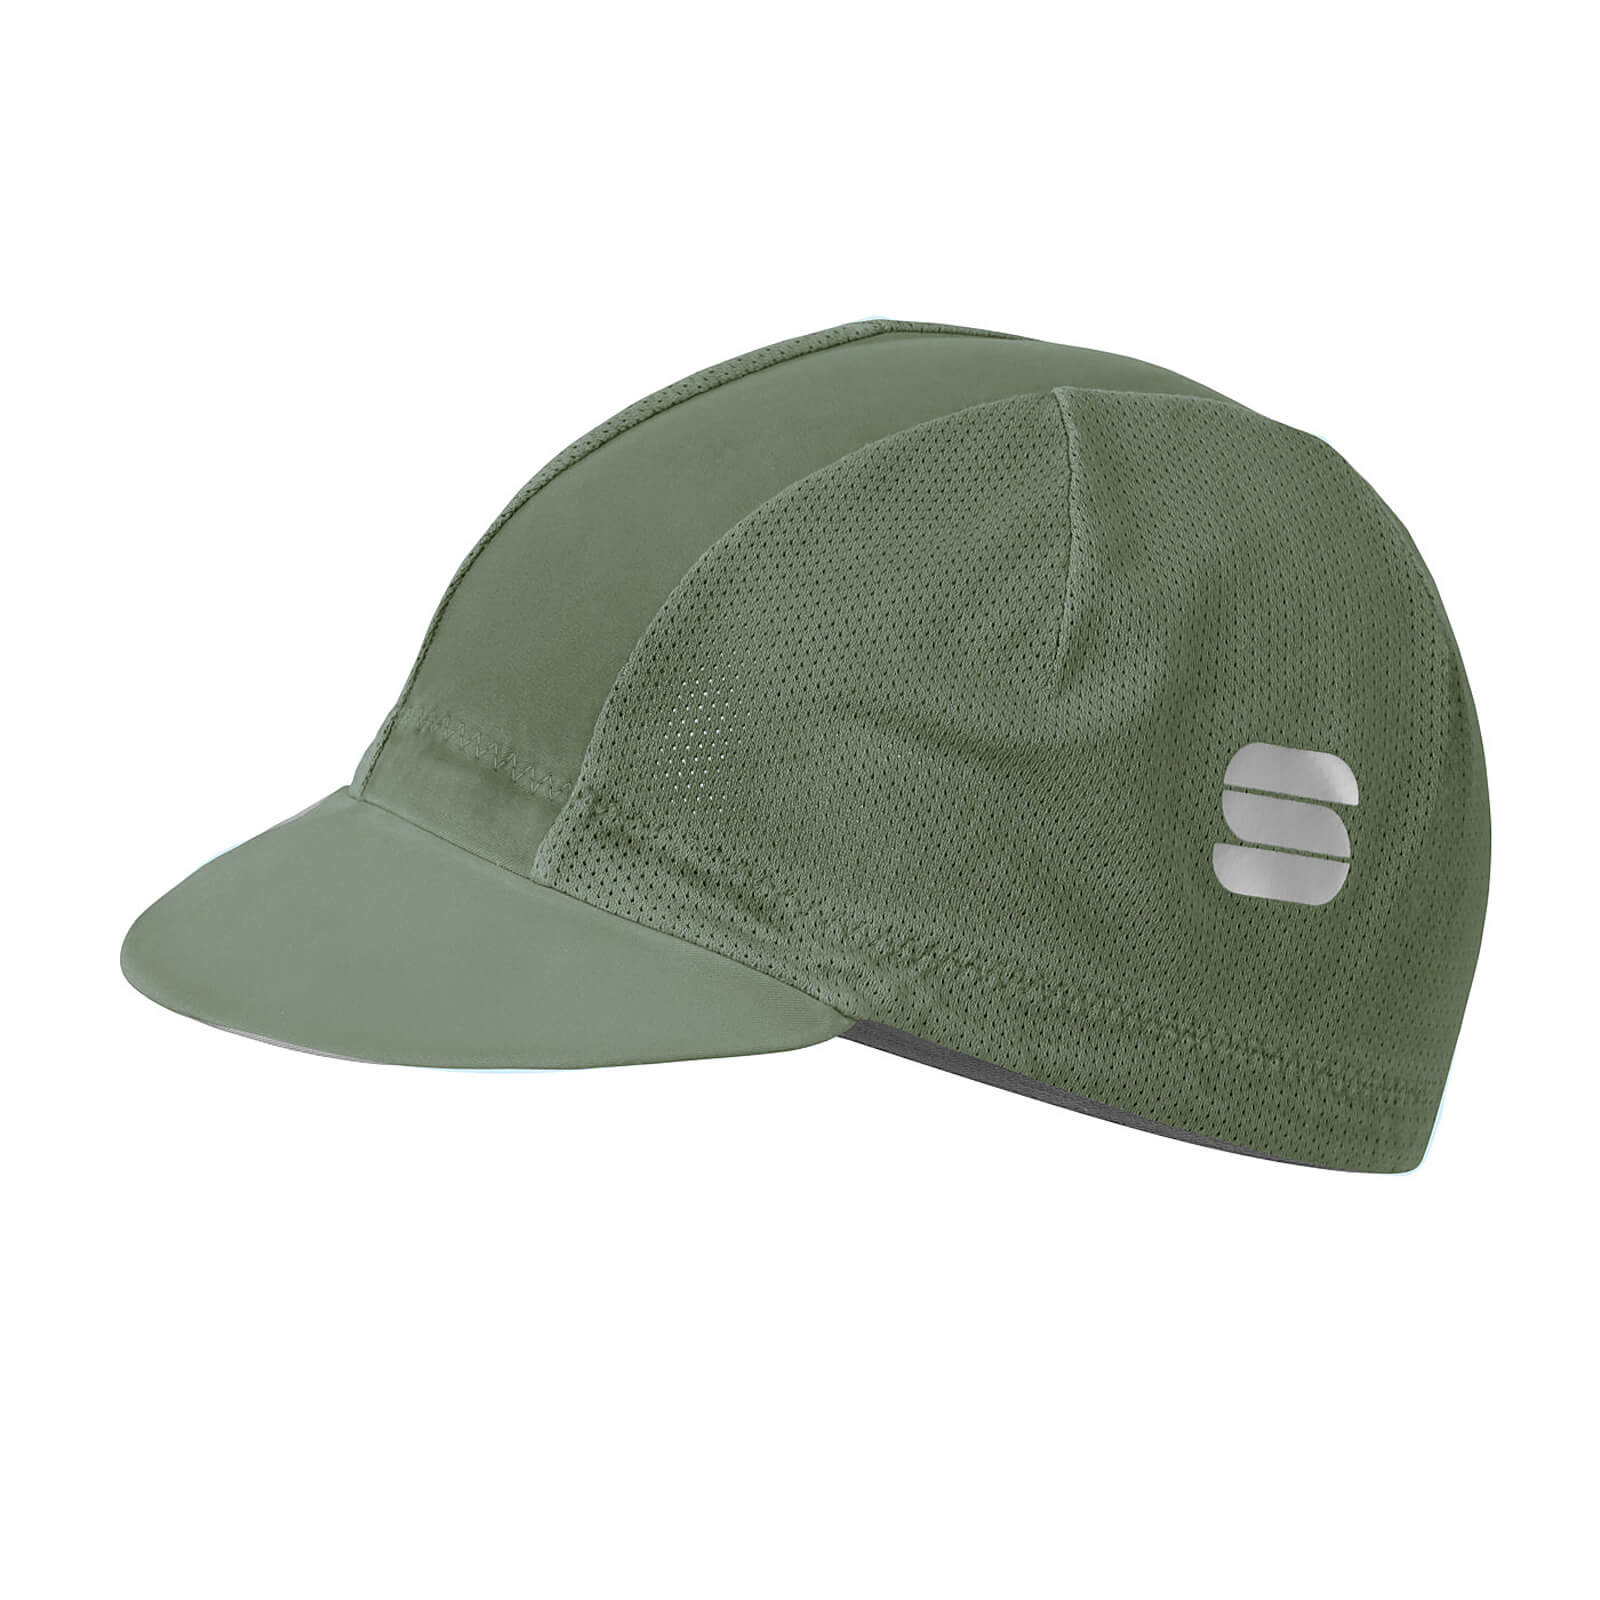 Sportful Monocrom Cap - Dry Green